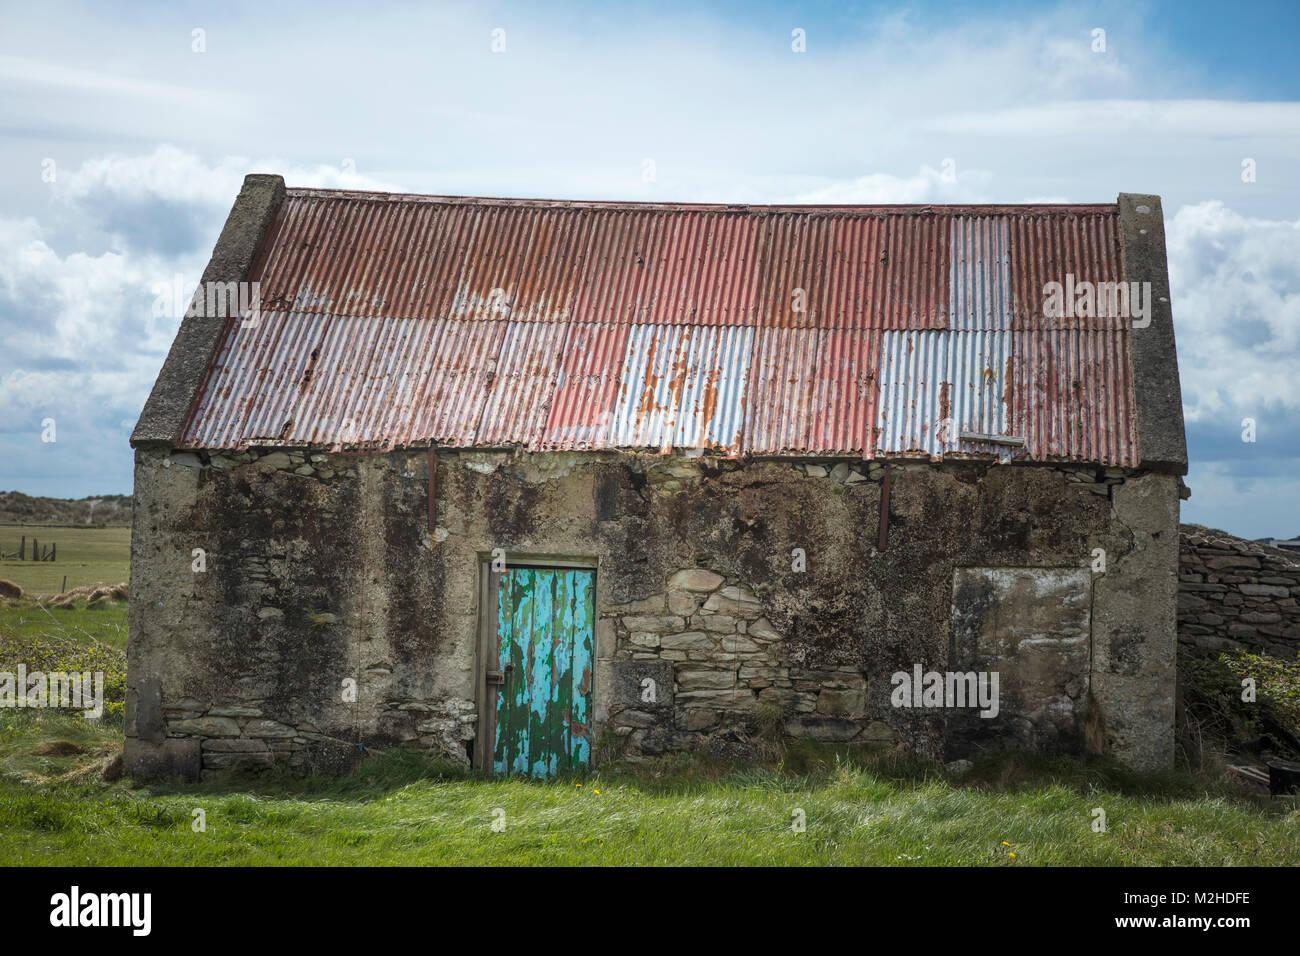 Old stone farm building, Achill Island, County Mayo, Ireland. - Stock Image